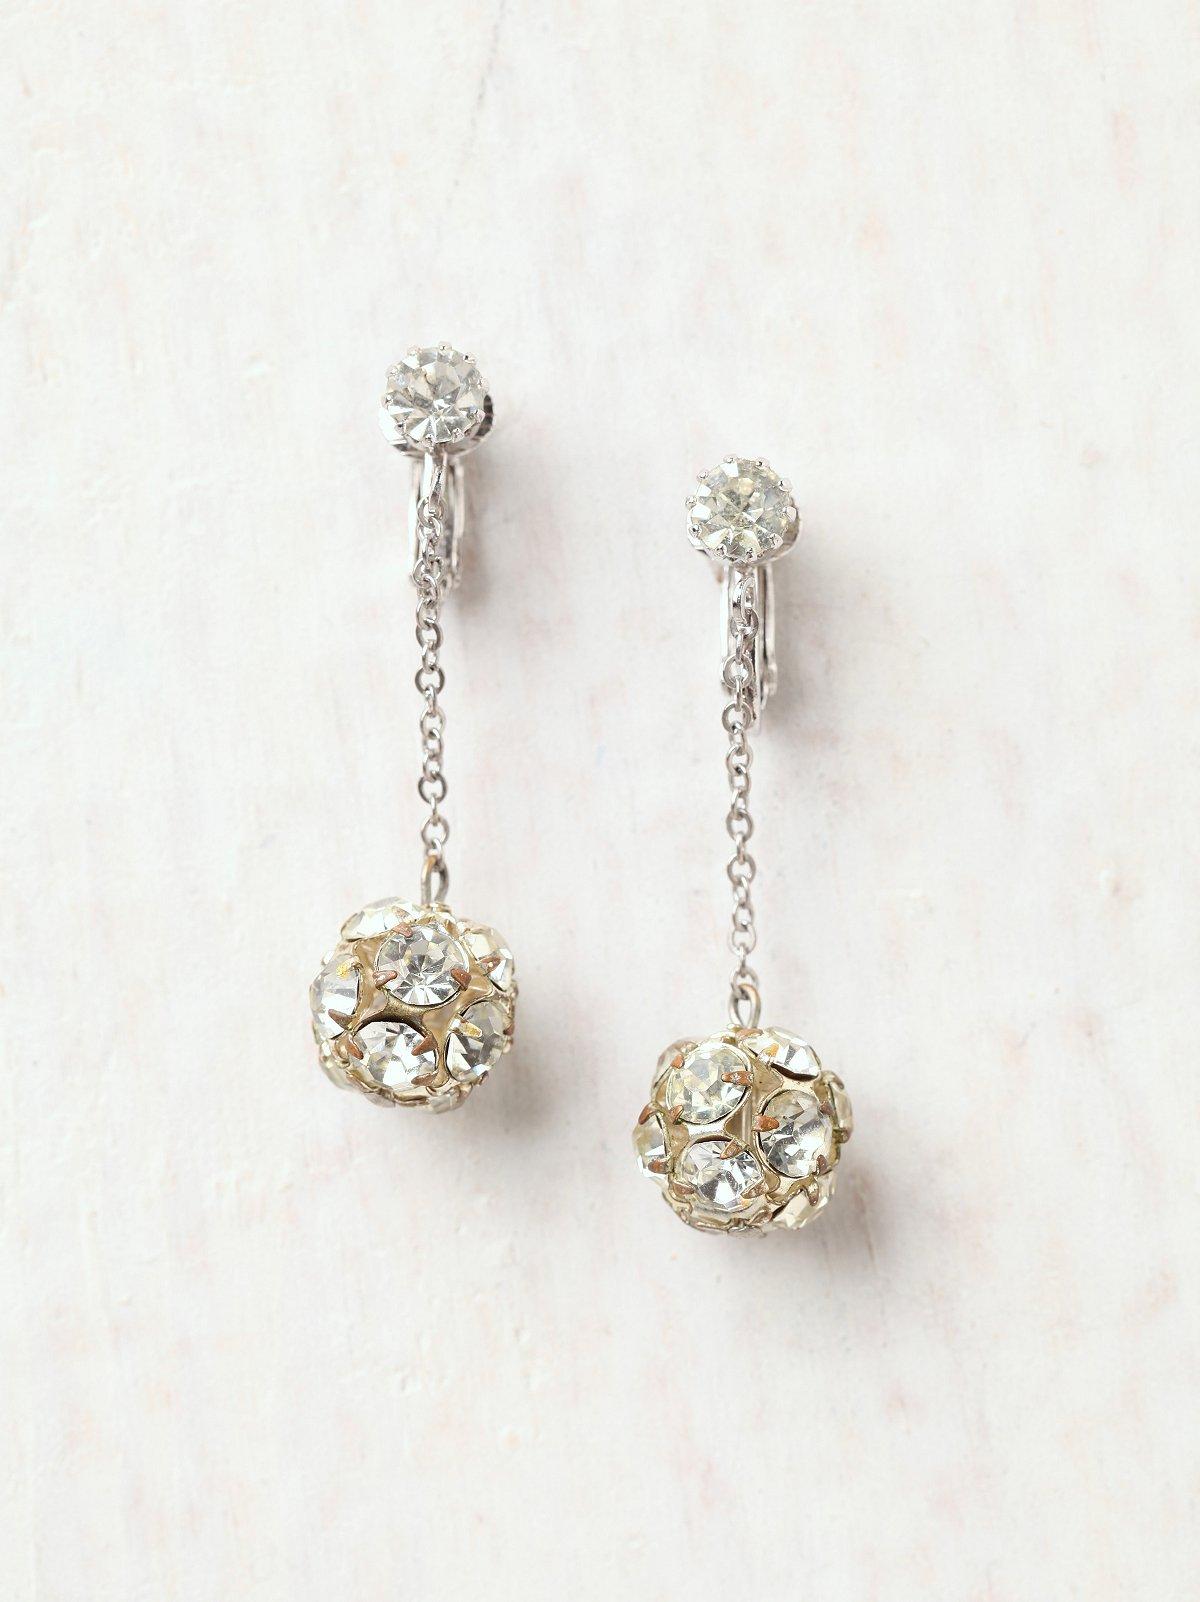 Vintage Canary Globe Earrings